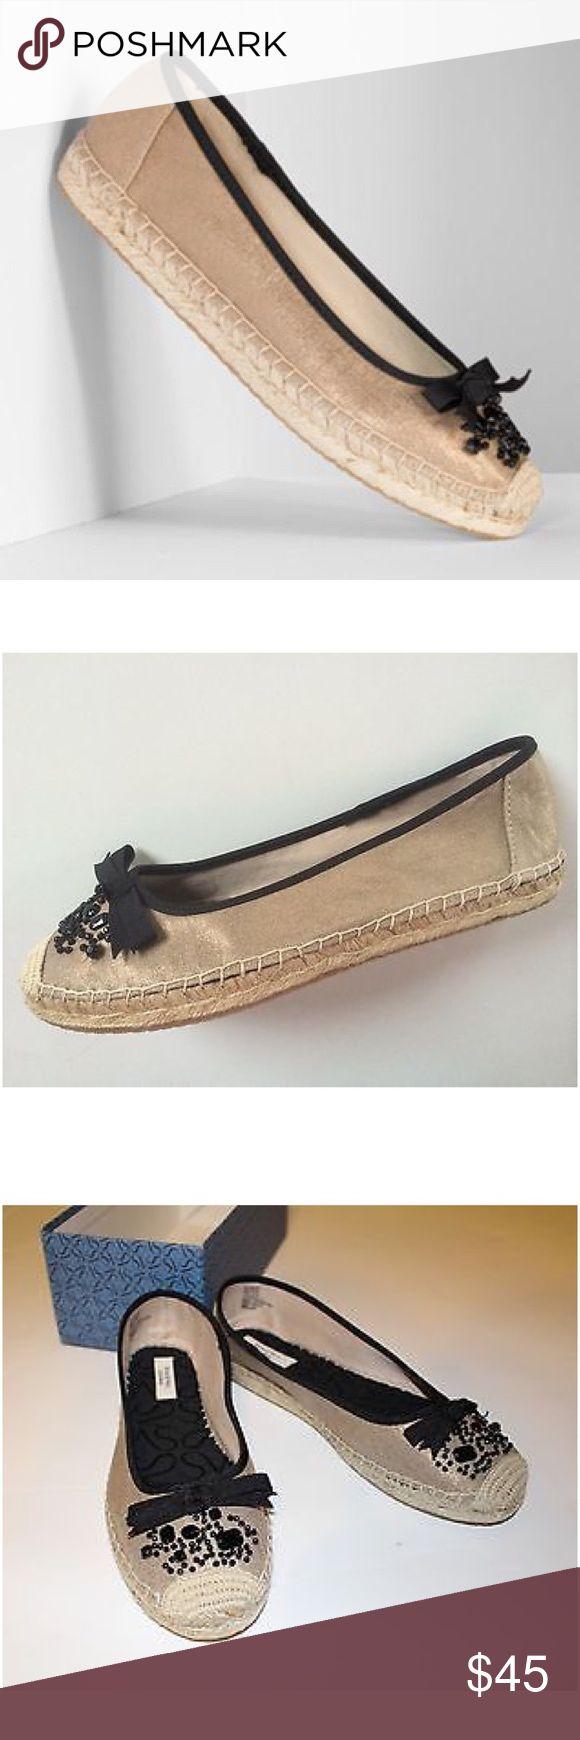 Vera Wang Bronze Jeweled Espadrille Shoes Vera Wang bronze iridescent w/black jeweled stone espadrille shoes will have you looking fab! Vera Wang Shoes Espadrilles